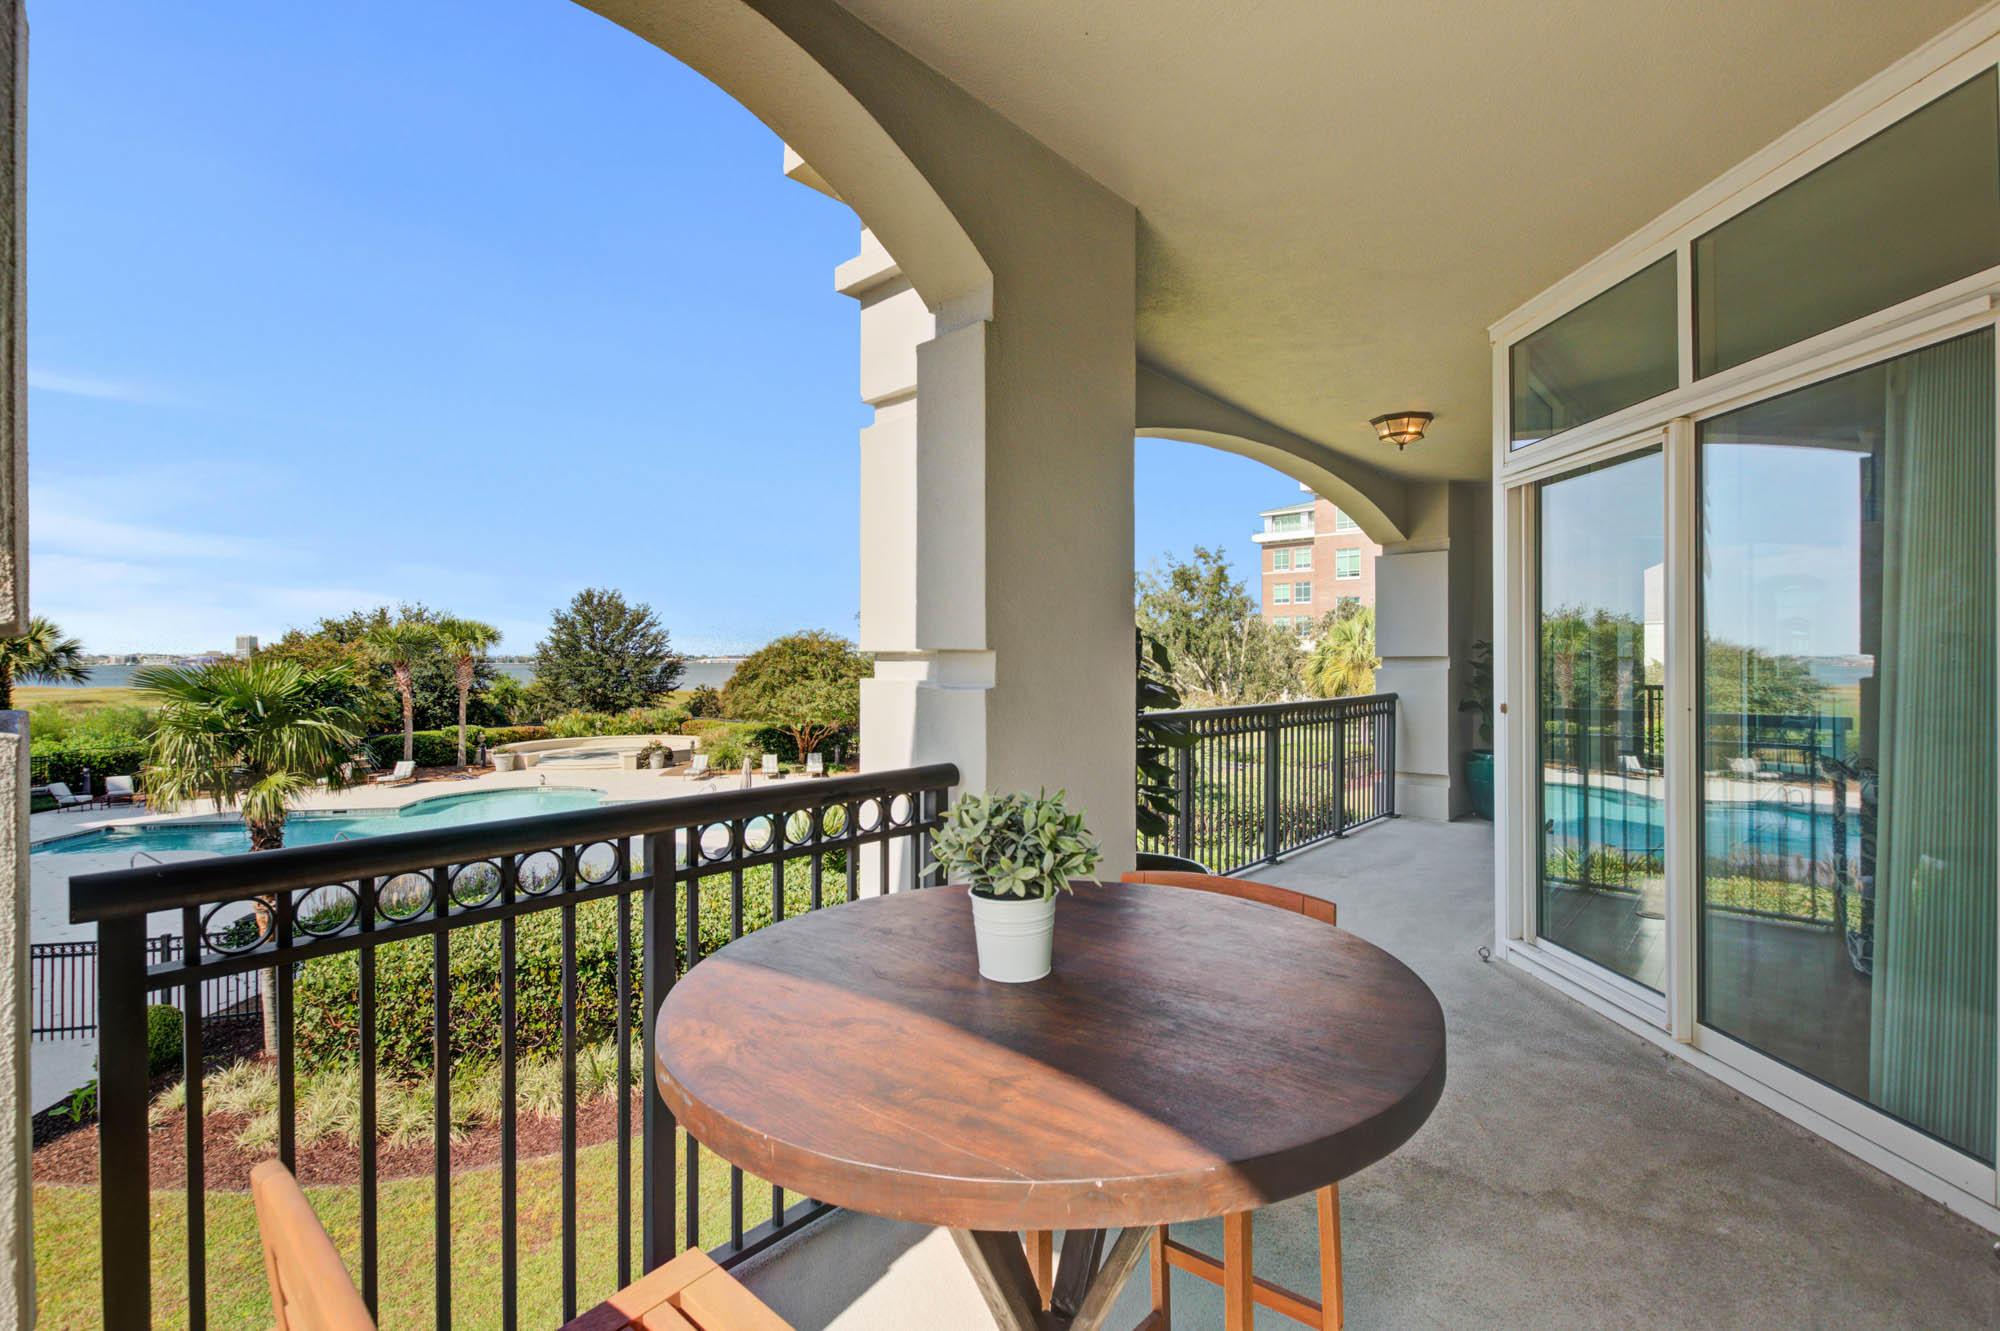 Renaissance On Chas Harbor Homes For Sale - 125 Plaza, Mount Pleasant, SC - 4